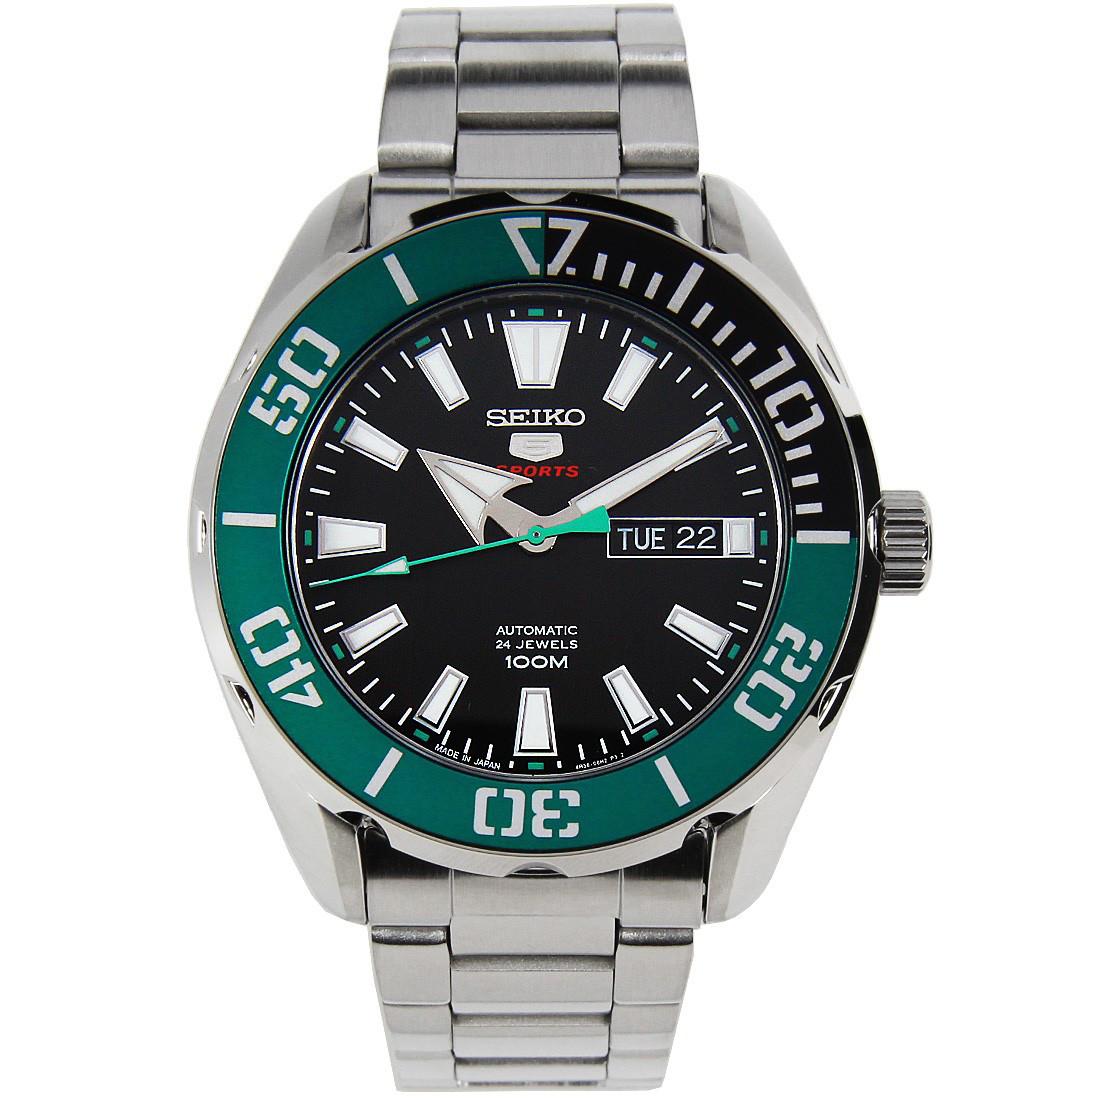 Часы Seiko 5 Sports SRPC53J1 Automatic 4R36